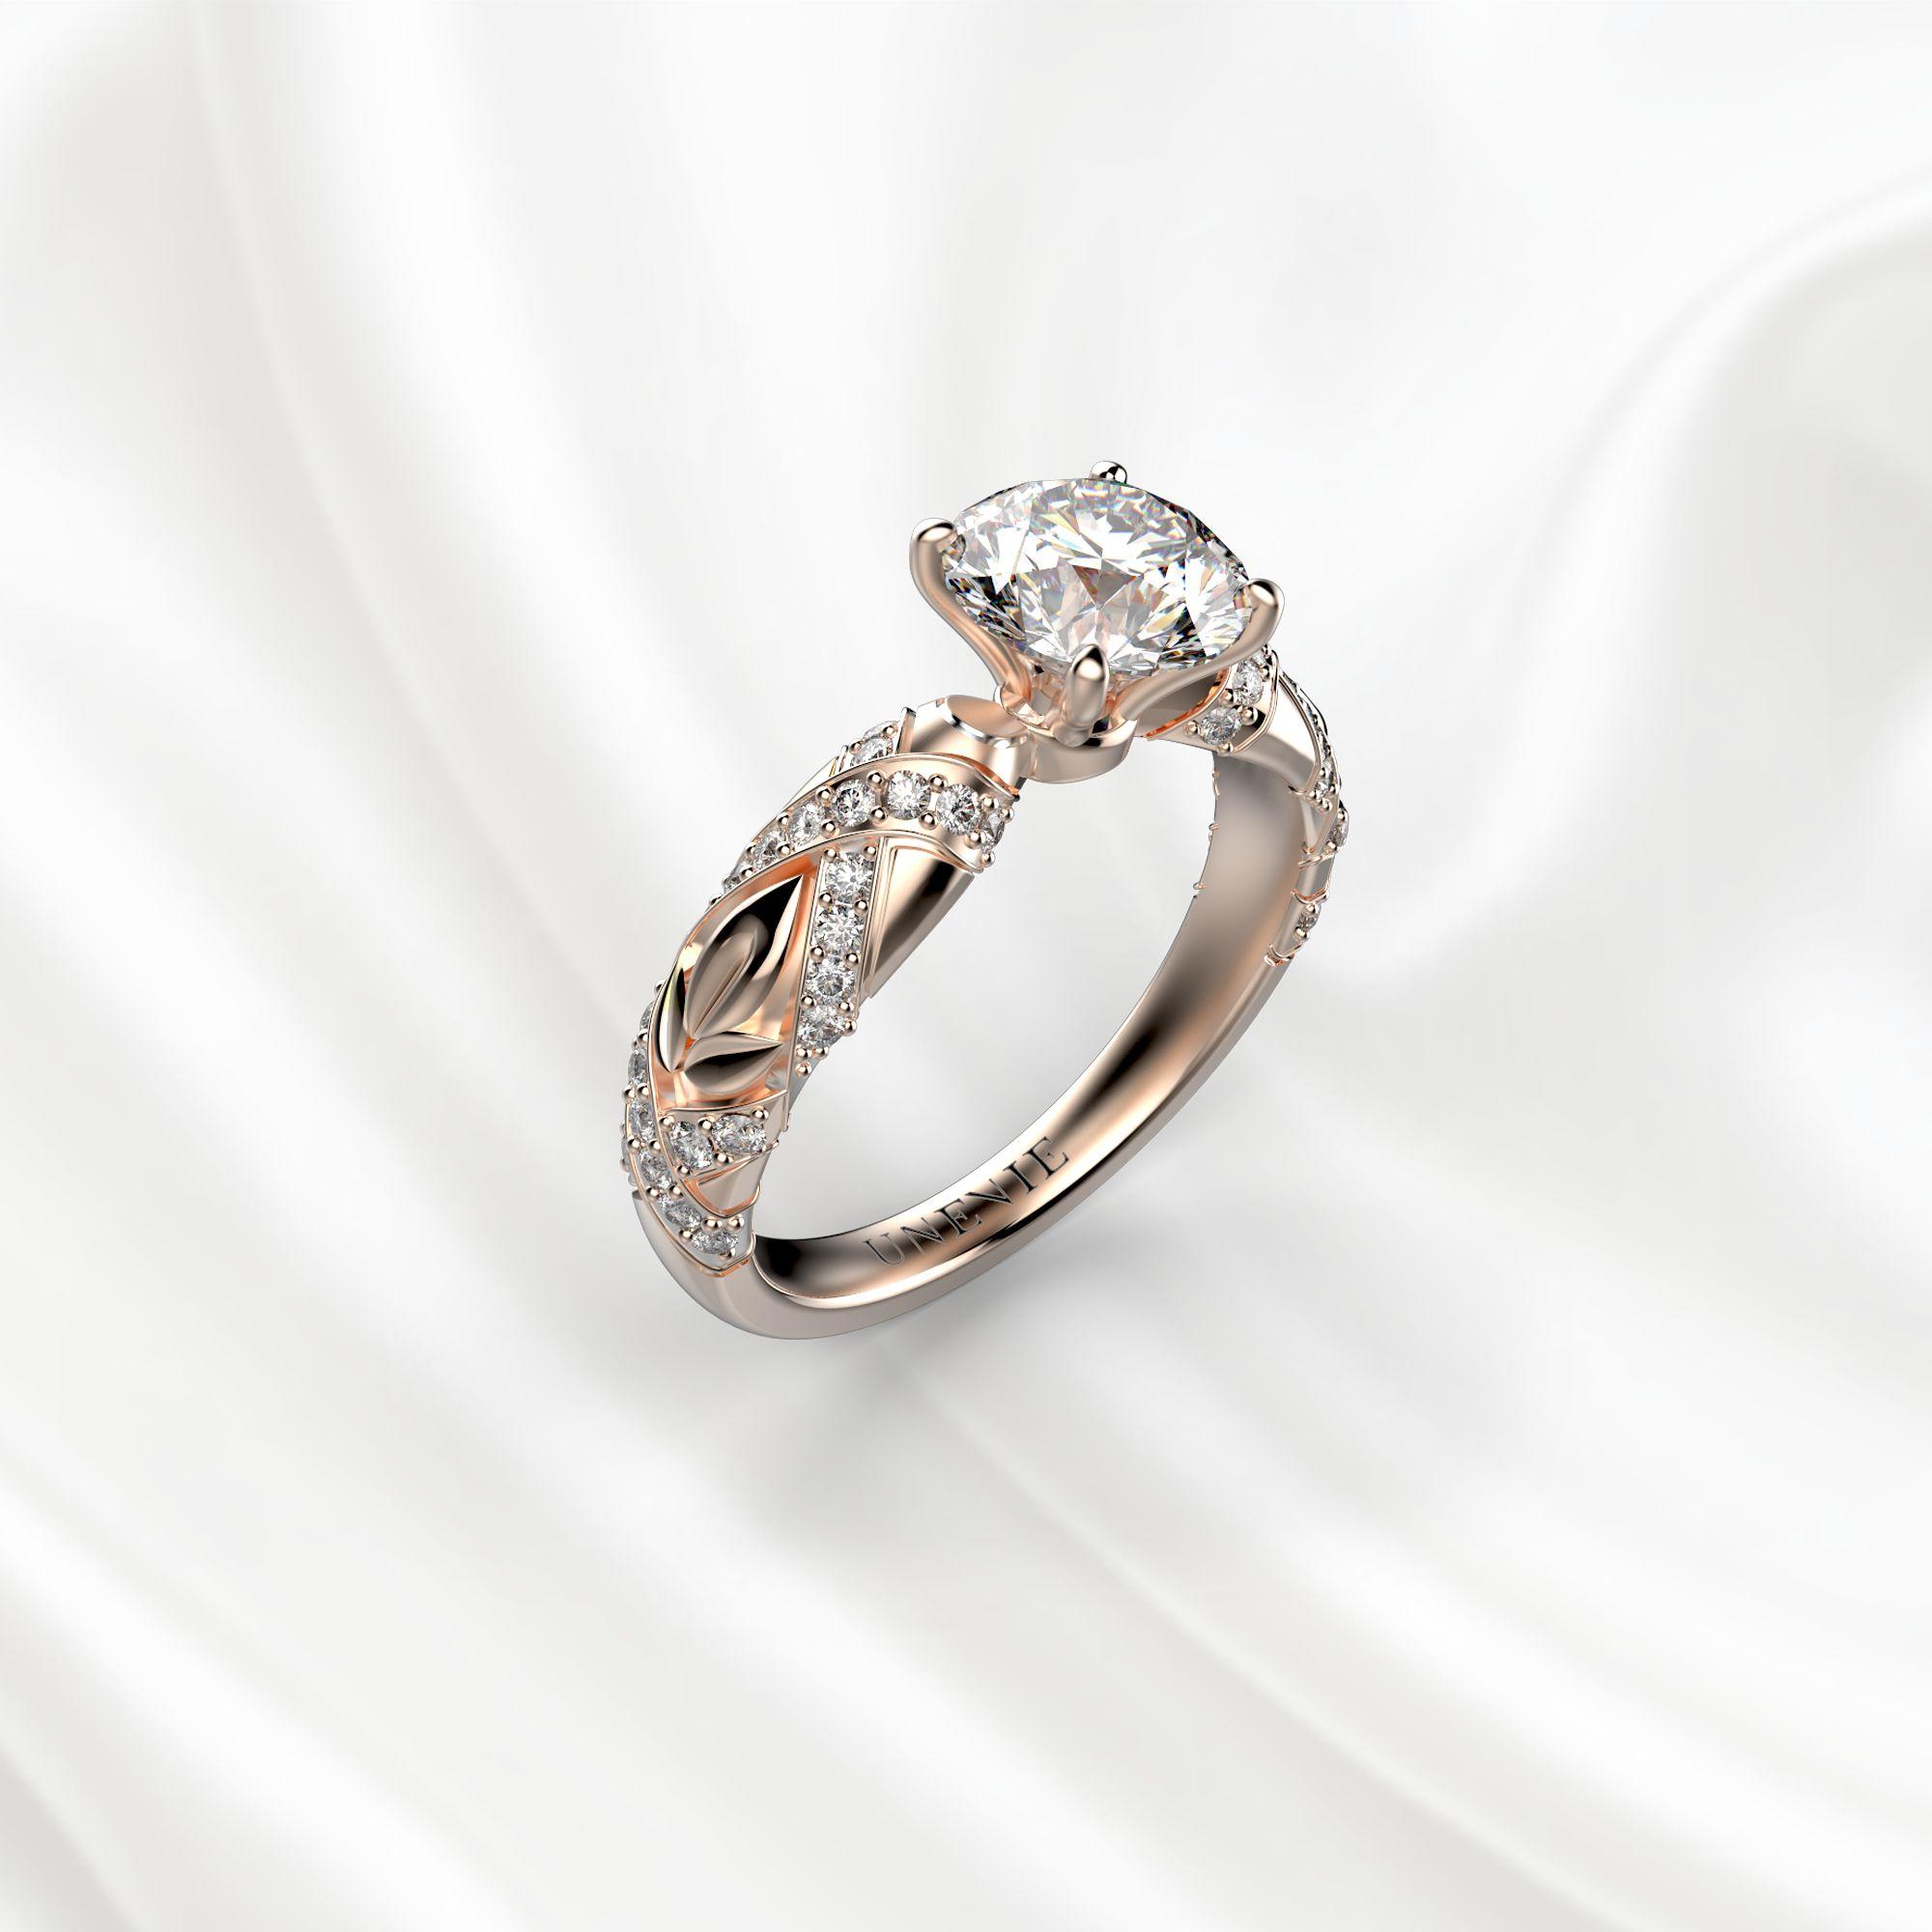 N17 Помолвочное кольцо из розового золота c 51 бриллиантом